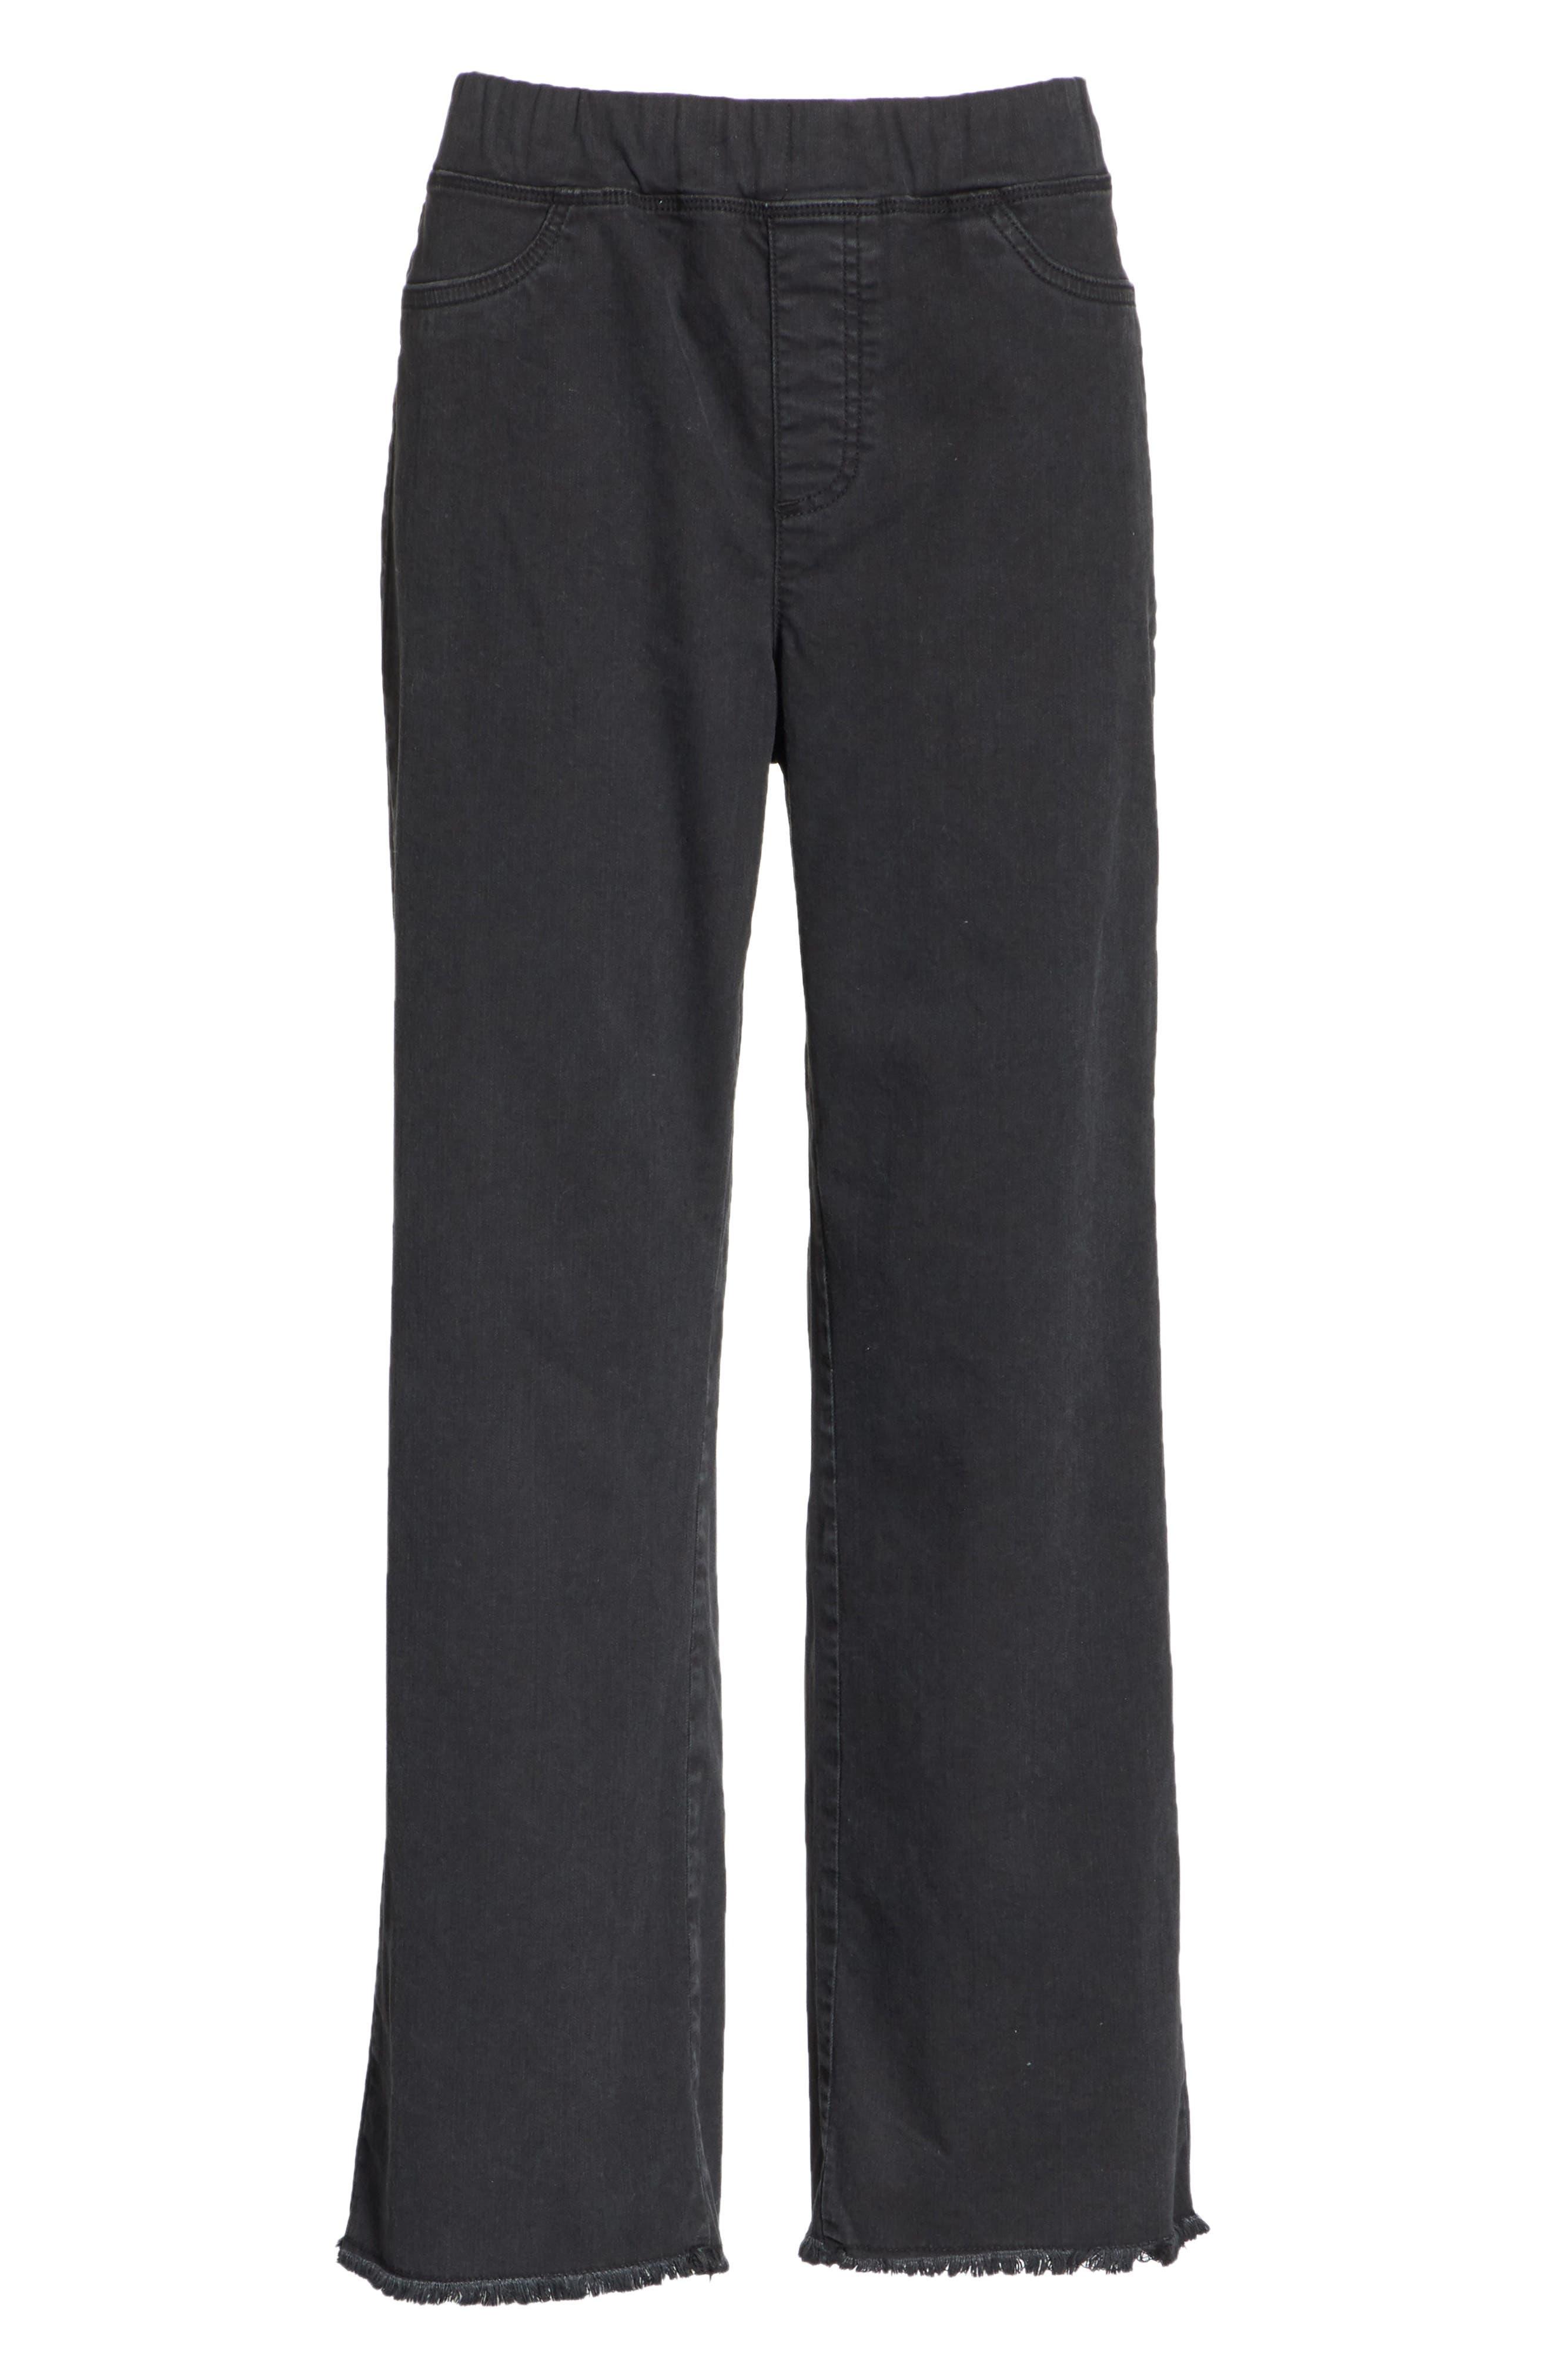 Frayed Hem Pull-On Ankle Jeans,                             Alternate thumbnail 6, color,                             WASHED BLACK